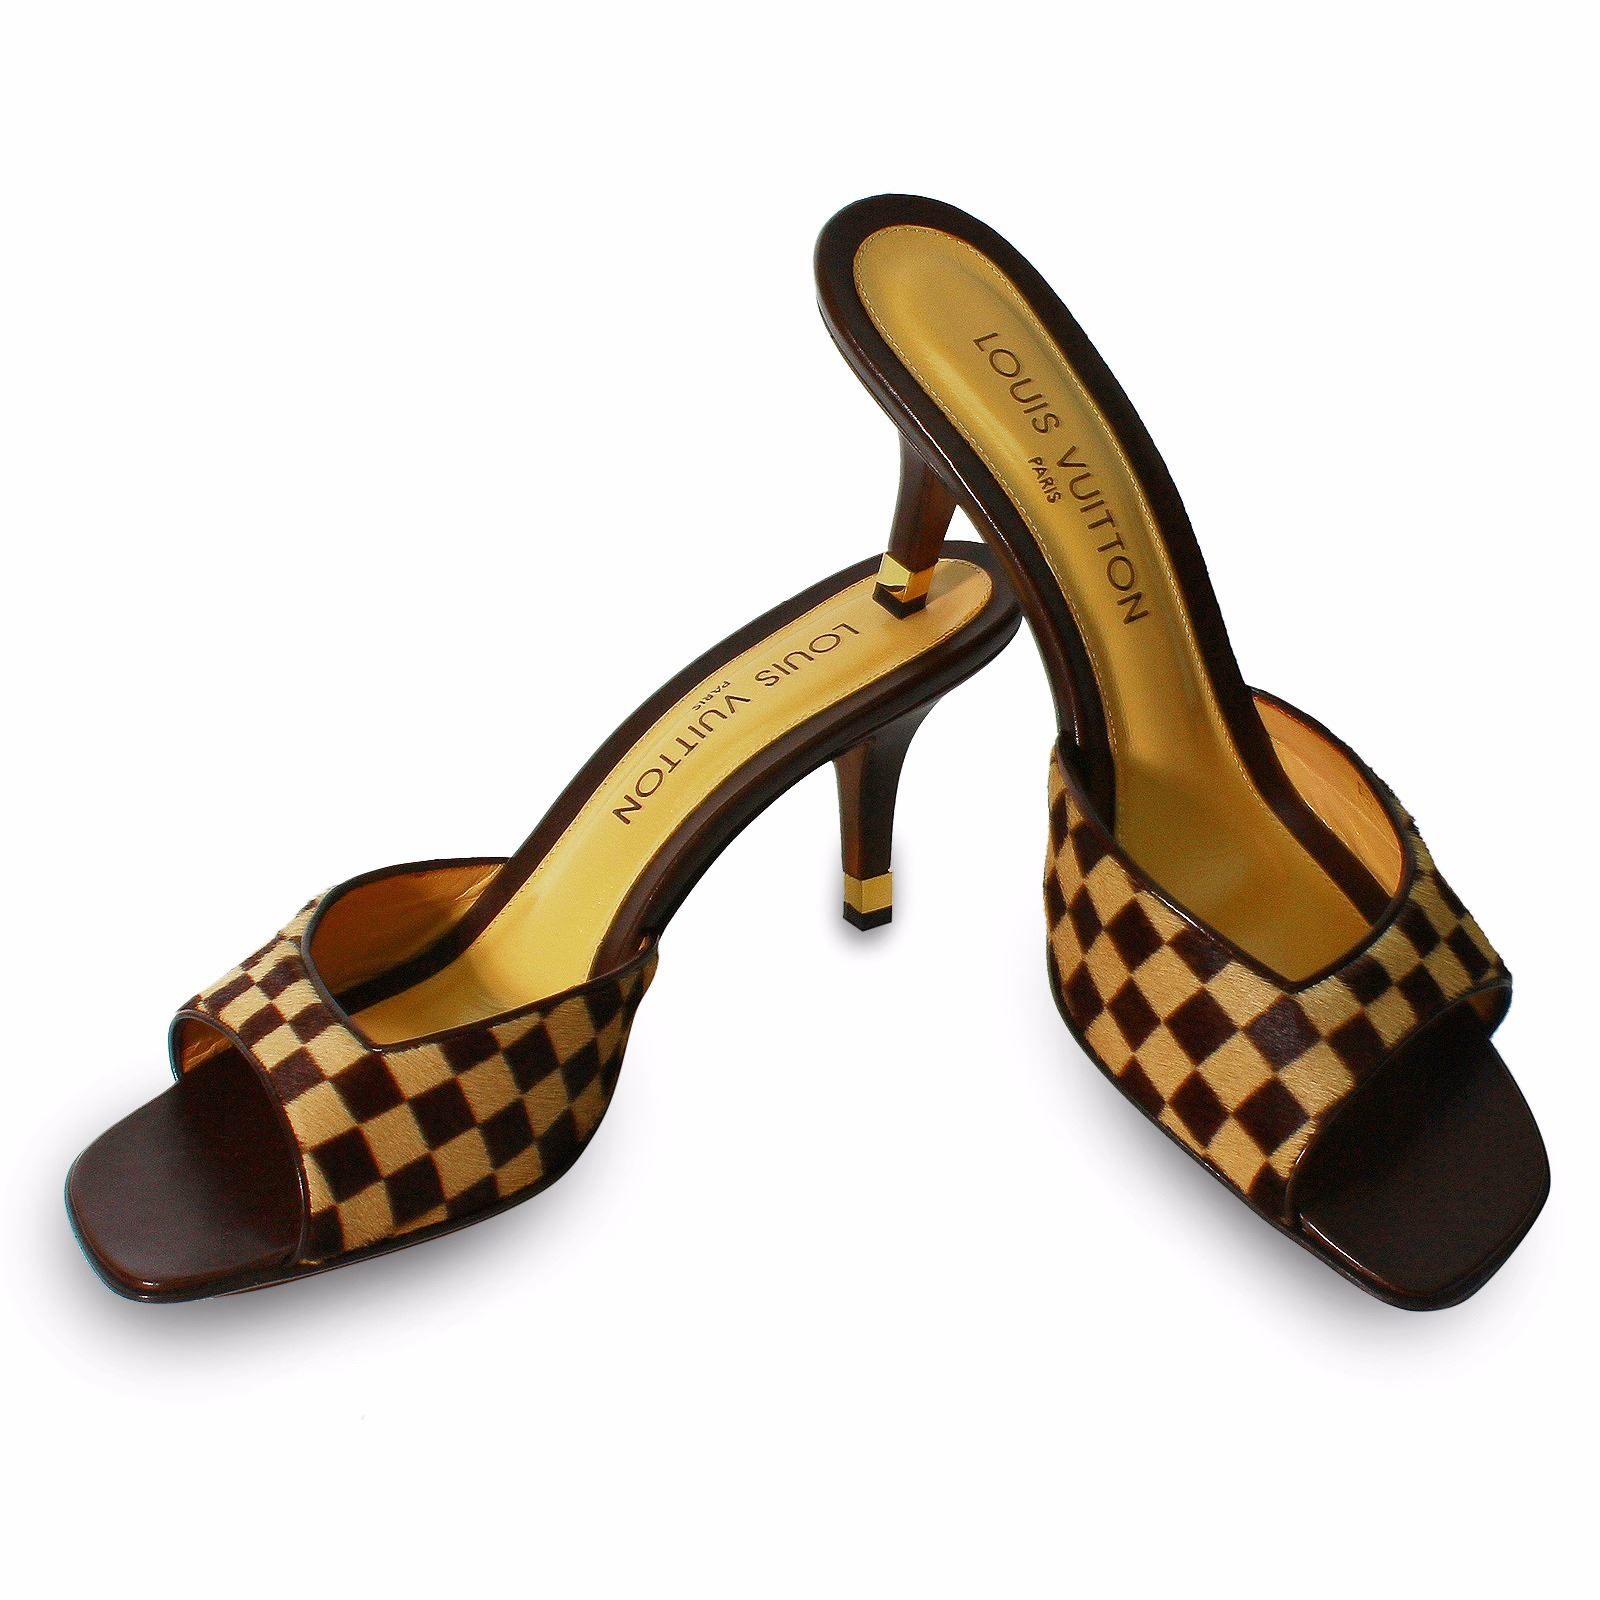 d815b2ae52aa Image 1   Louis Vuitton Damier Sauvage Shoes Sz 39.5 -  611 ...